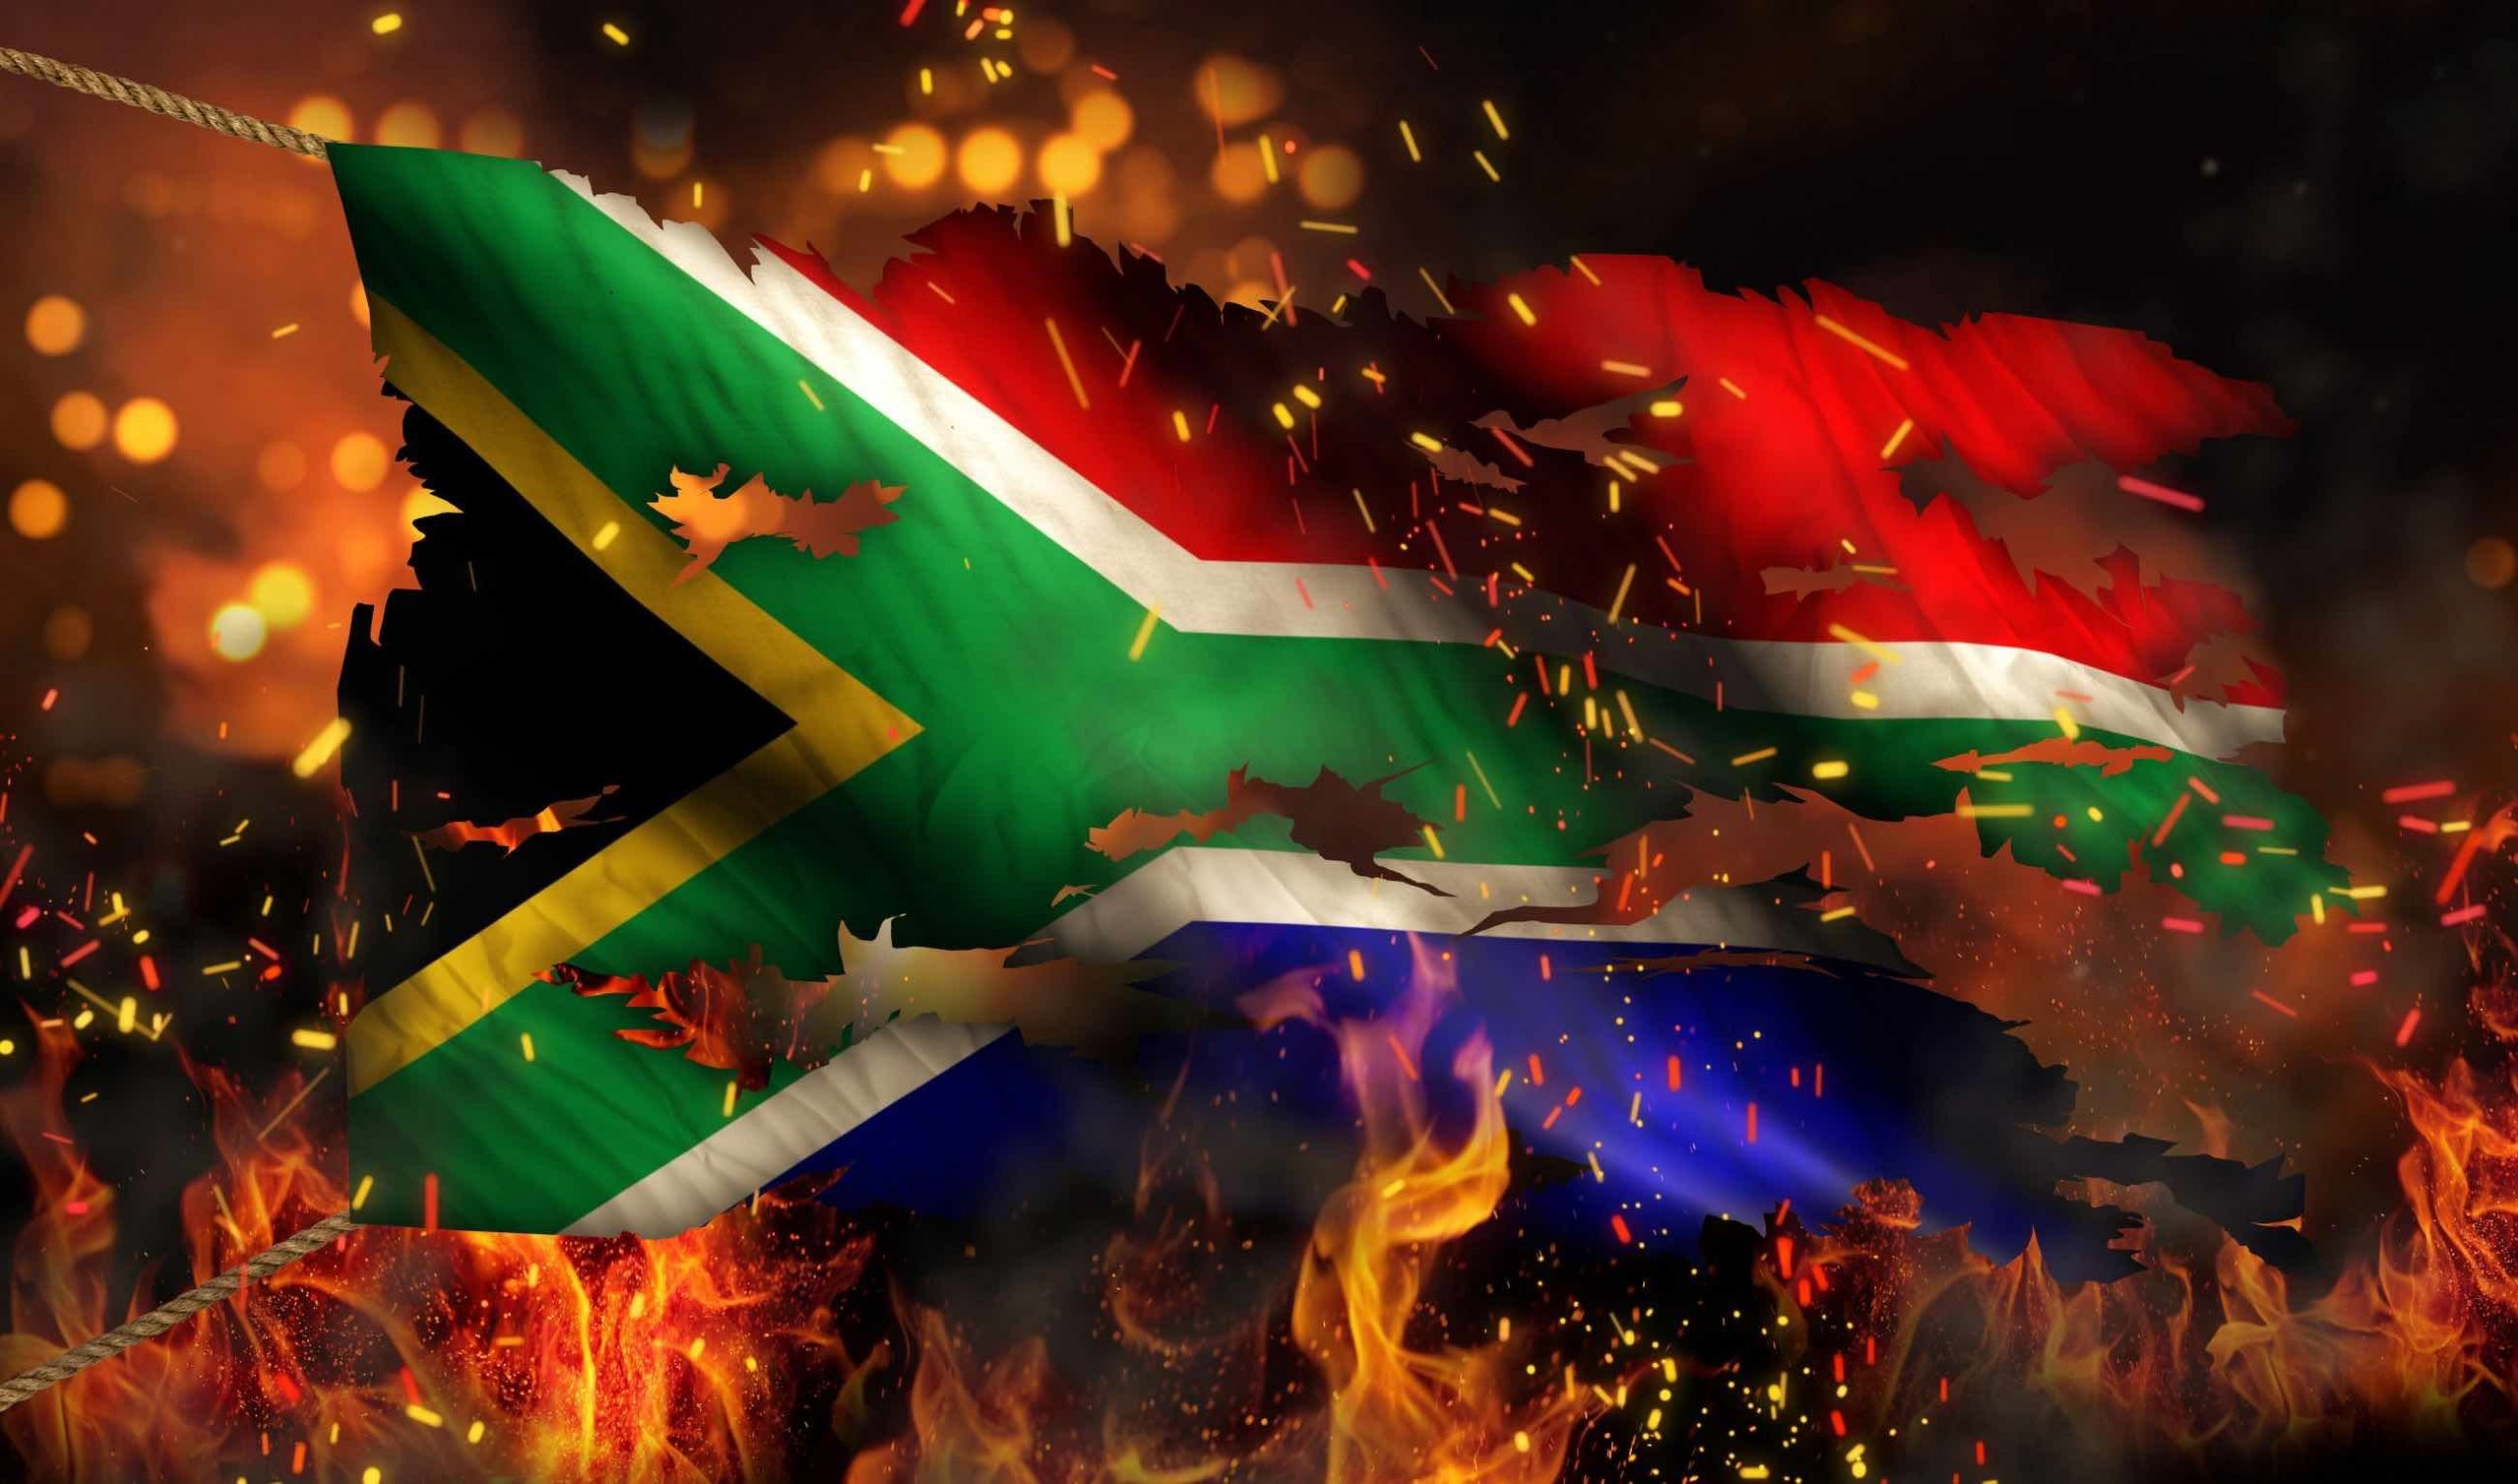 #SouthAfricaBurning